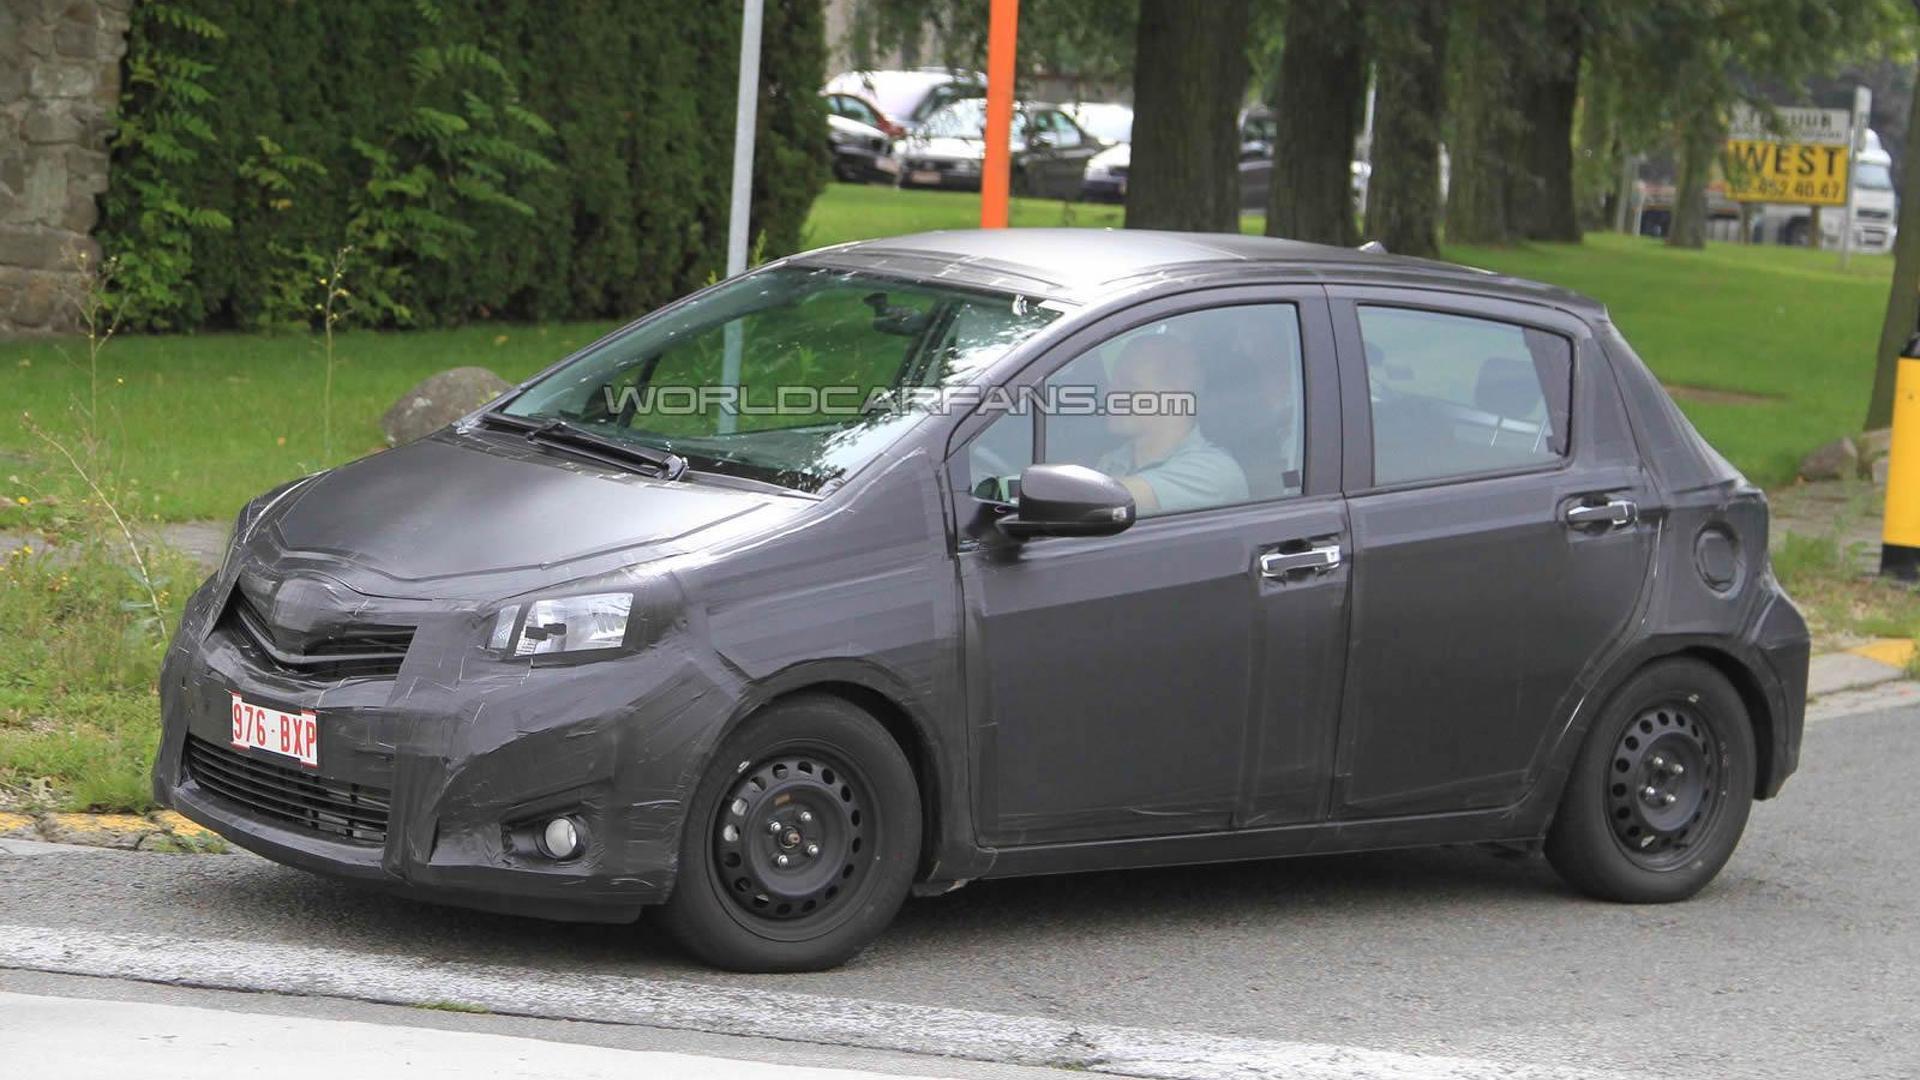 2012 Toyota Yaris prototype already on the road